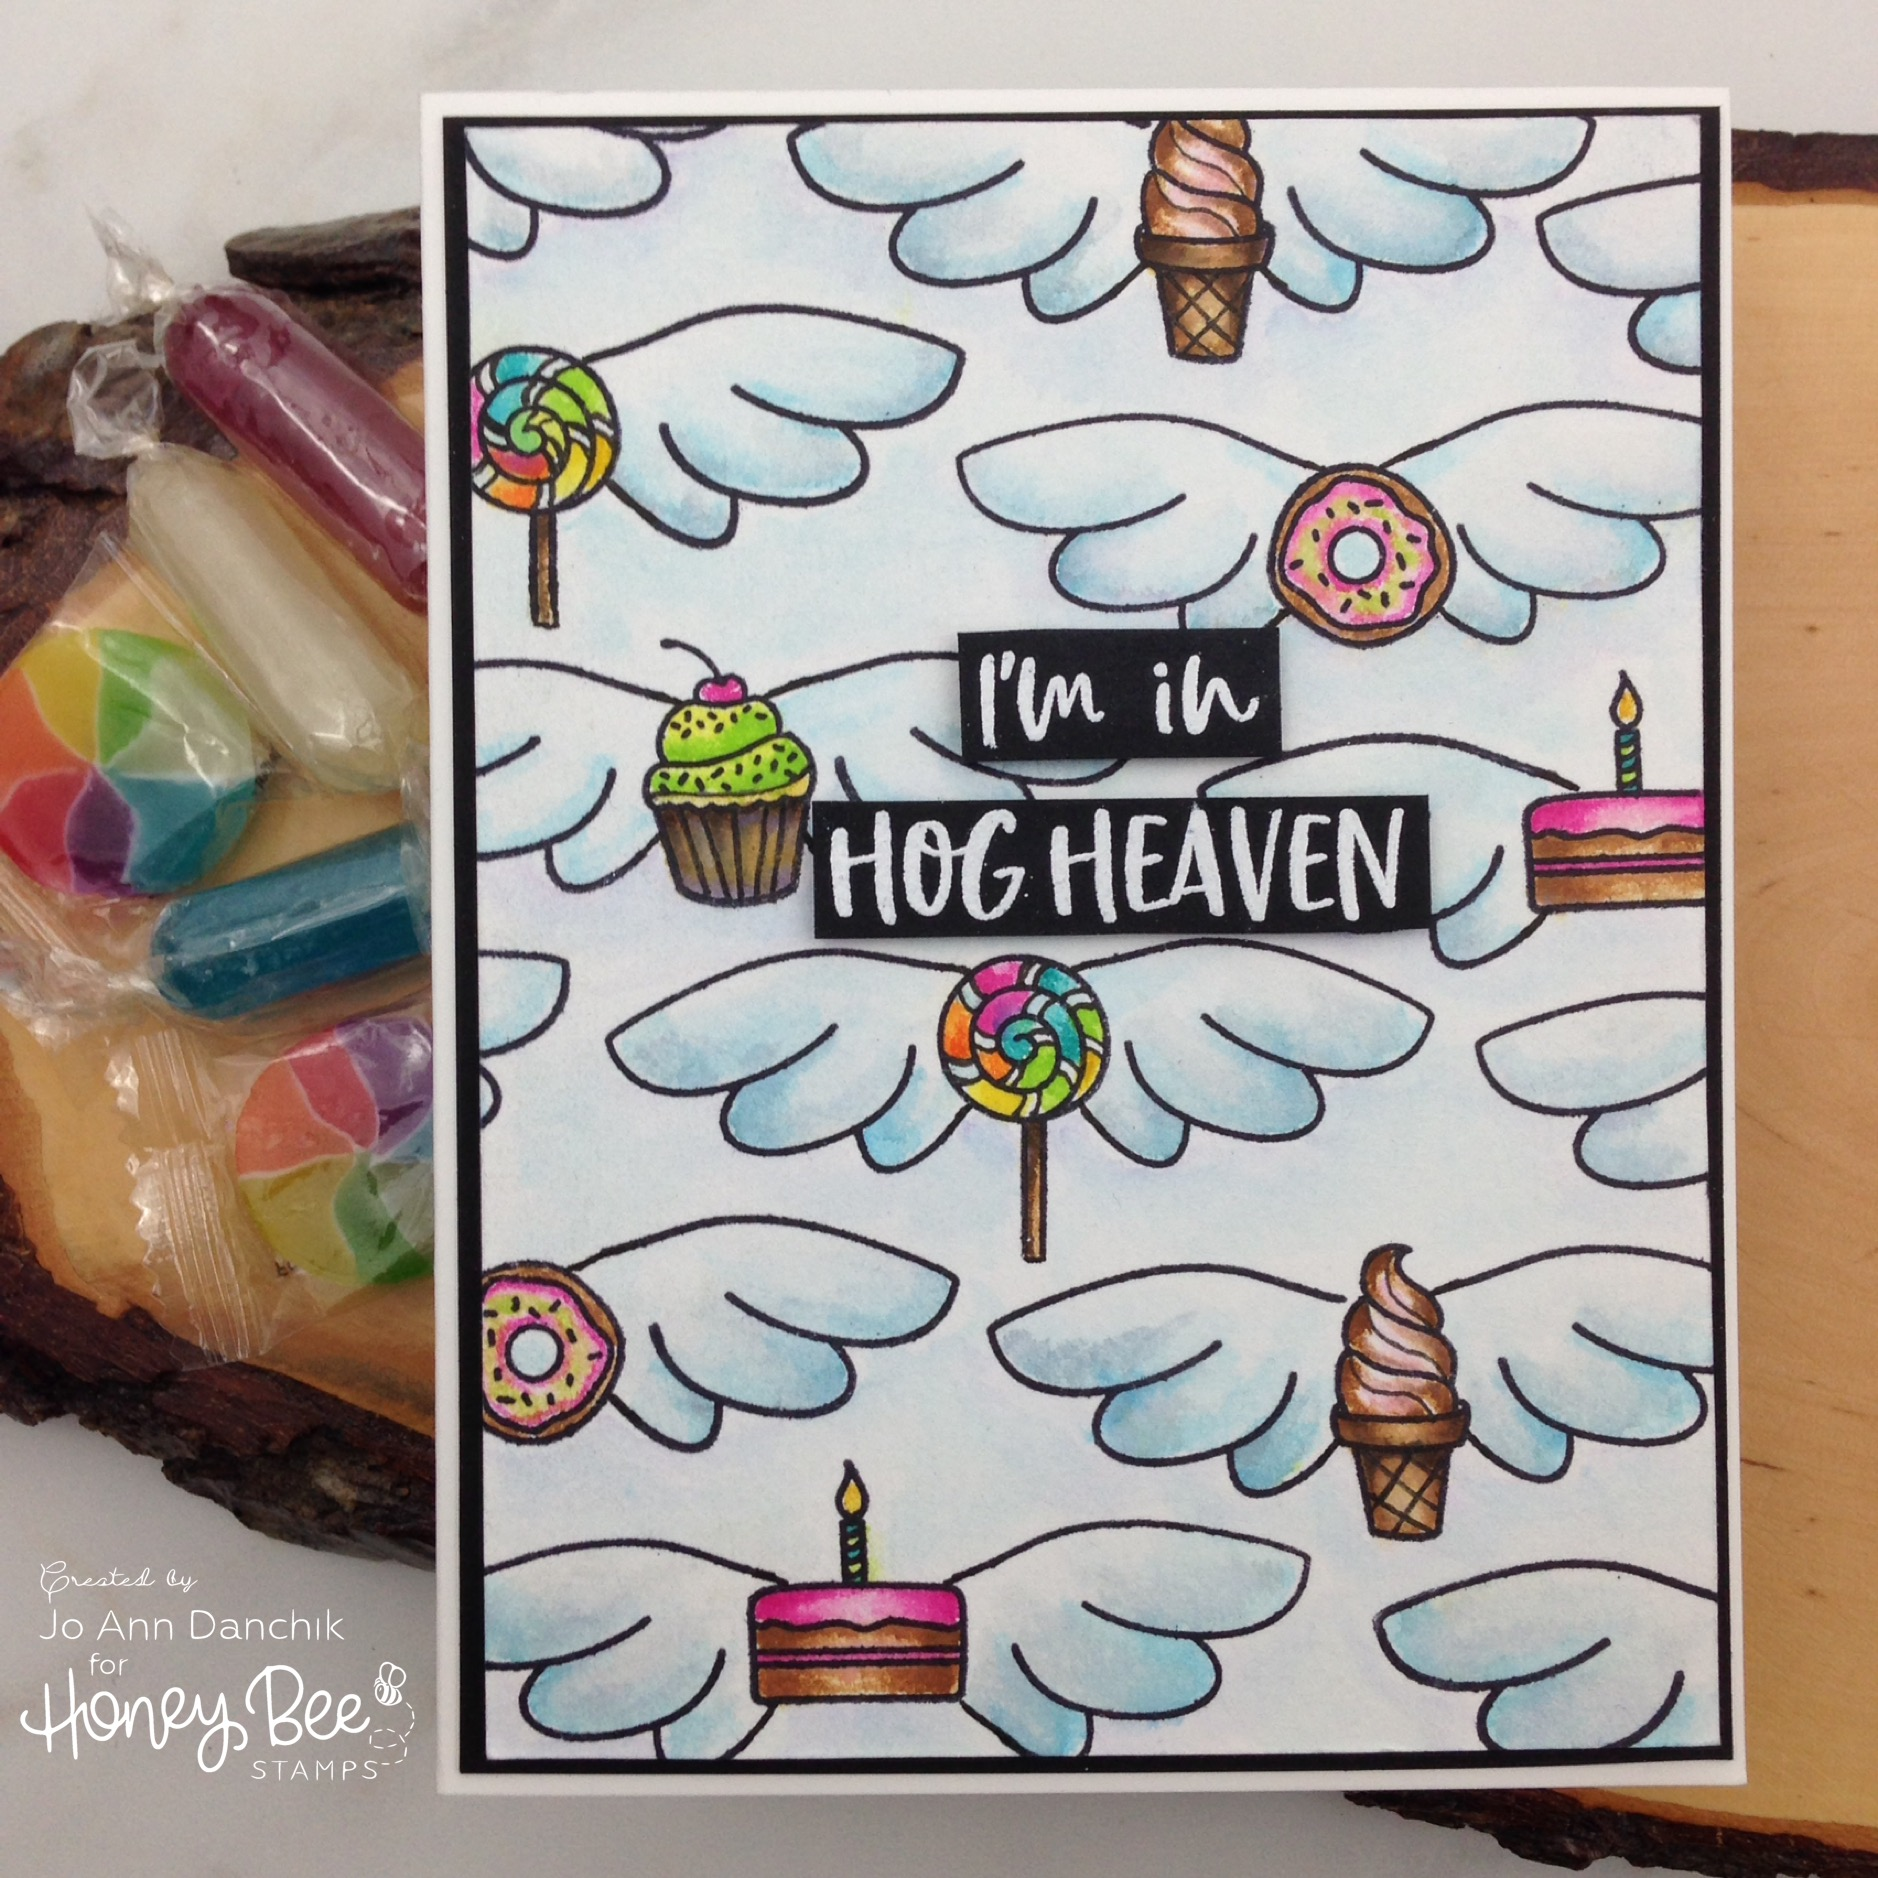 Creative Sundays With Jo Ann: I'm In Hog Heaven